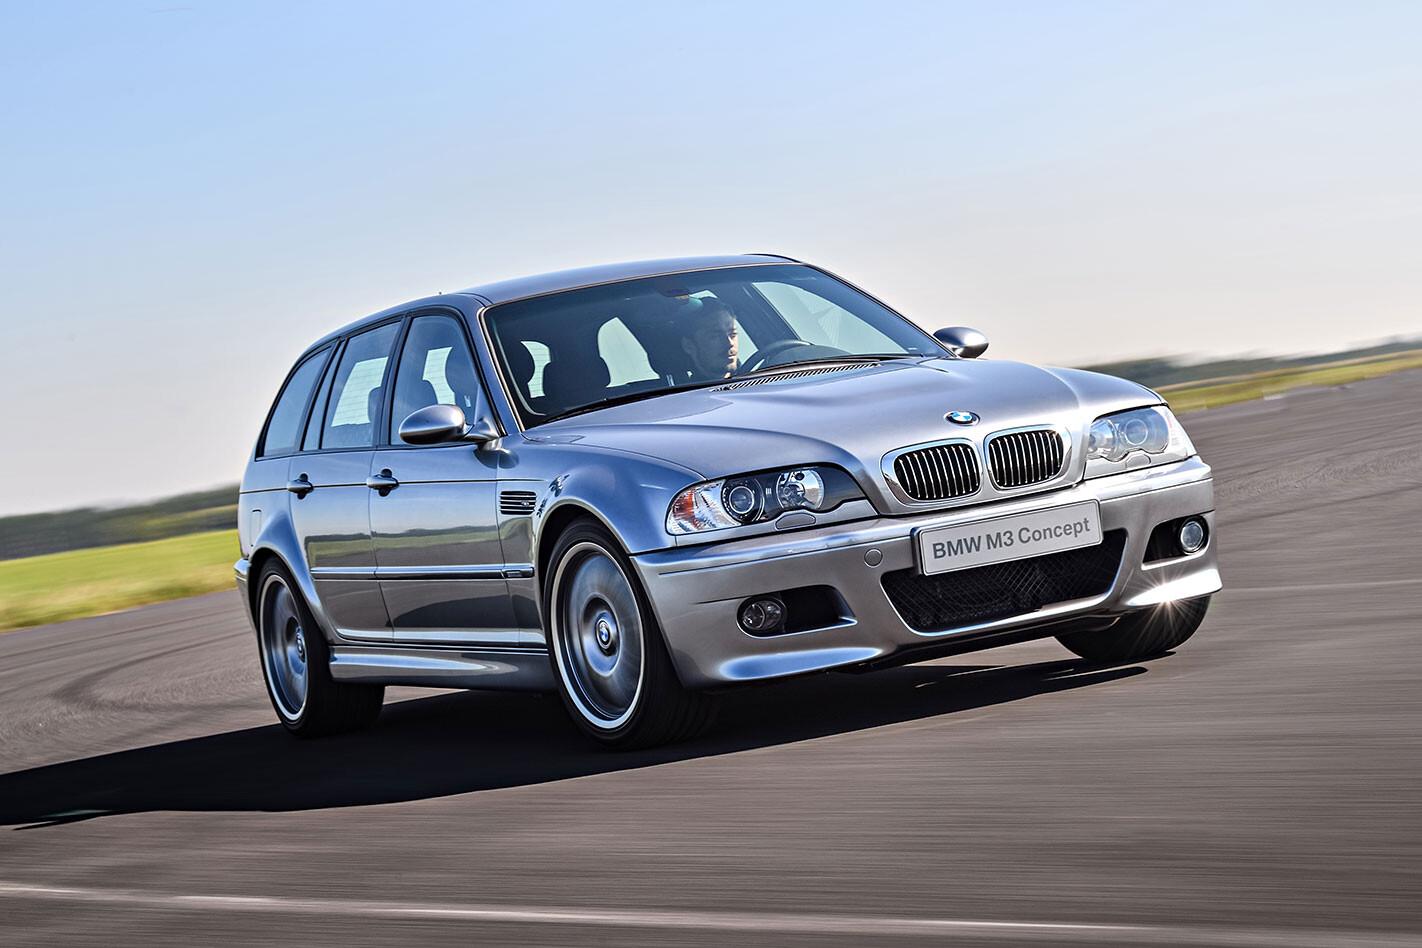 BMW E46 M3 Touring driving through a corner.